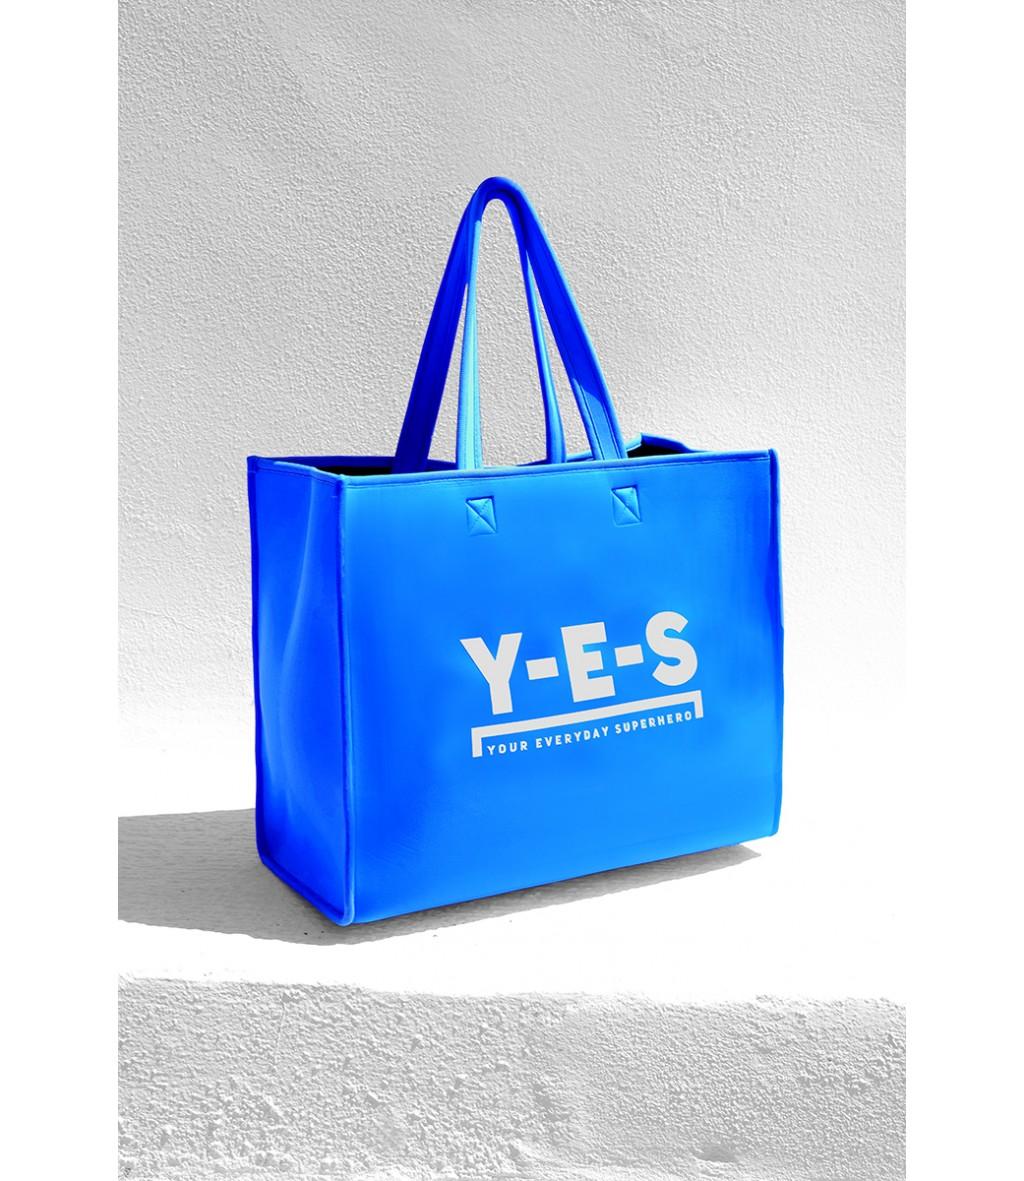 Borsa shopper in neoprene YES azzurro royal con logo frontale bianco